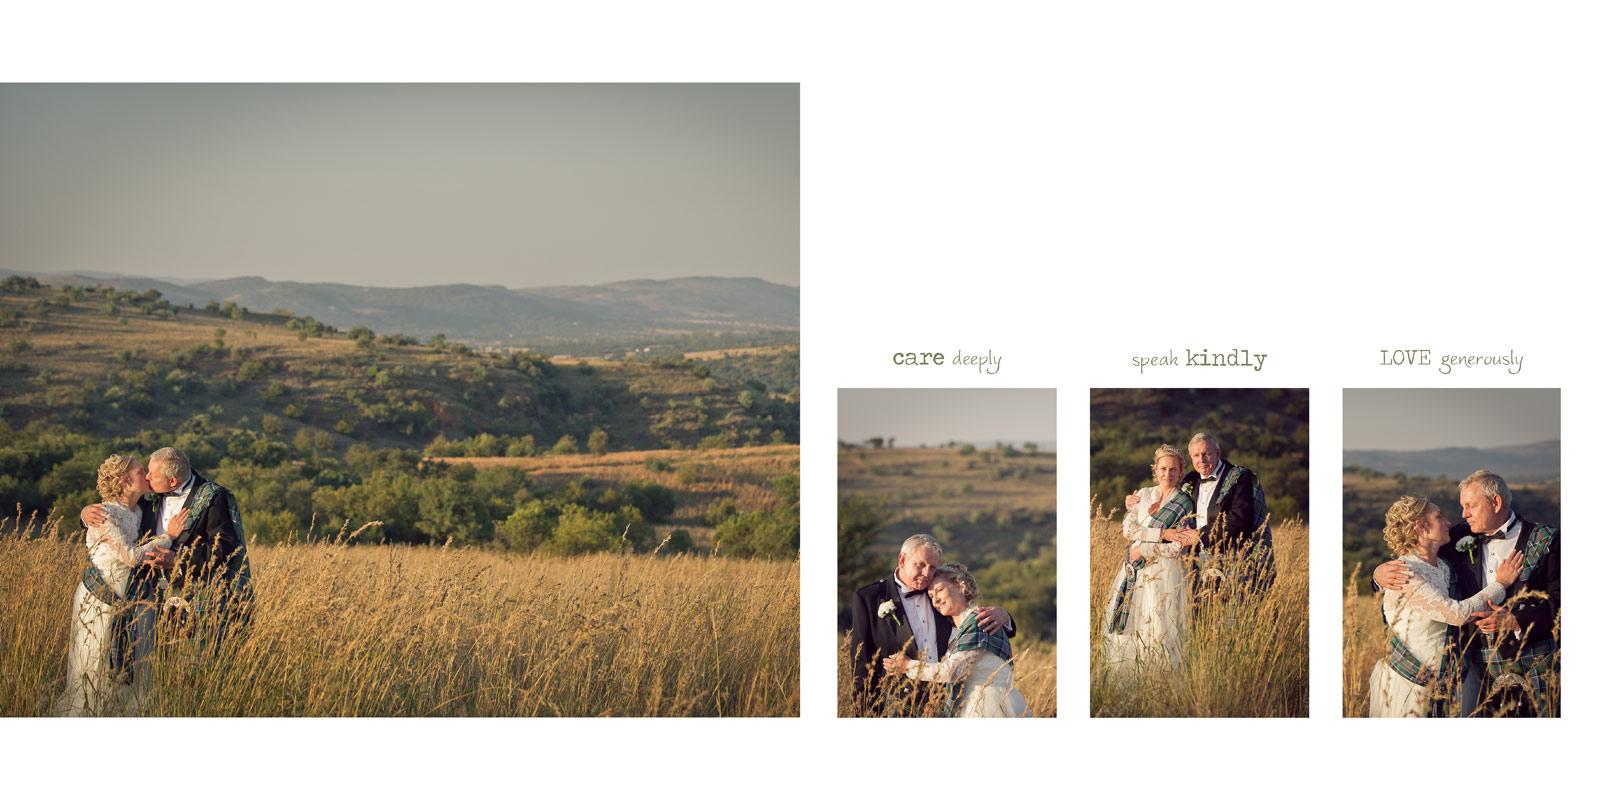 Nathalie Boucry Photography | Deidre and Lister Wedding Album 026